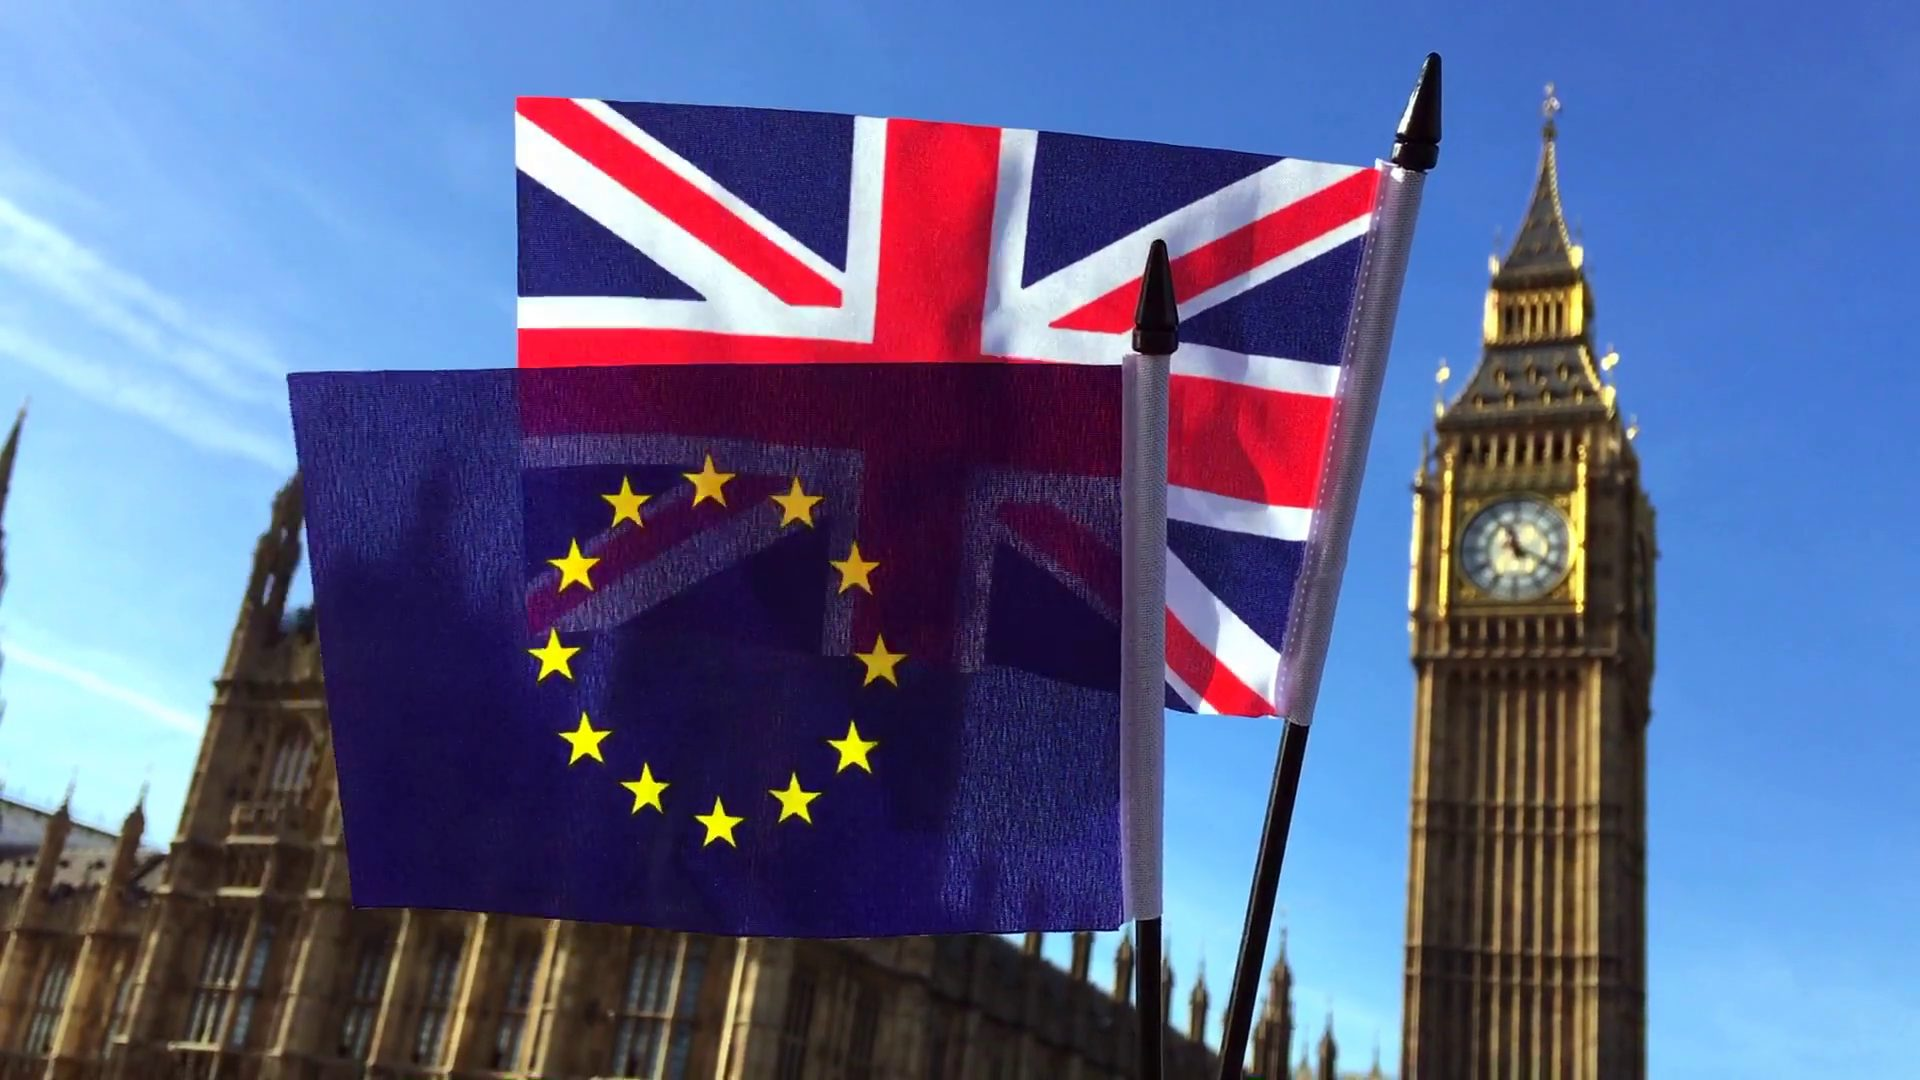 Oficial britanic: Londra nu va organiza un al doilea referendum privind Brexit